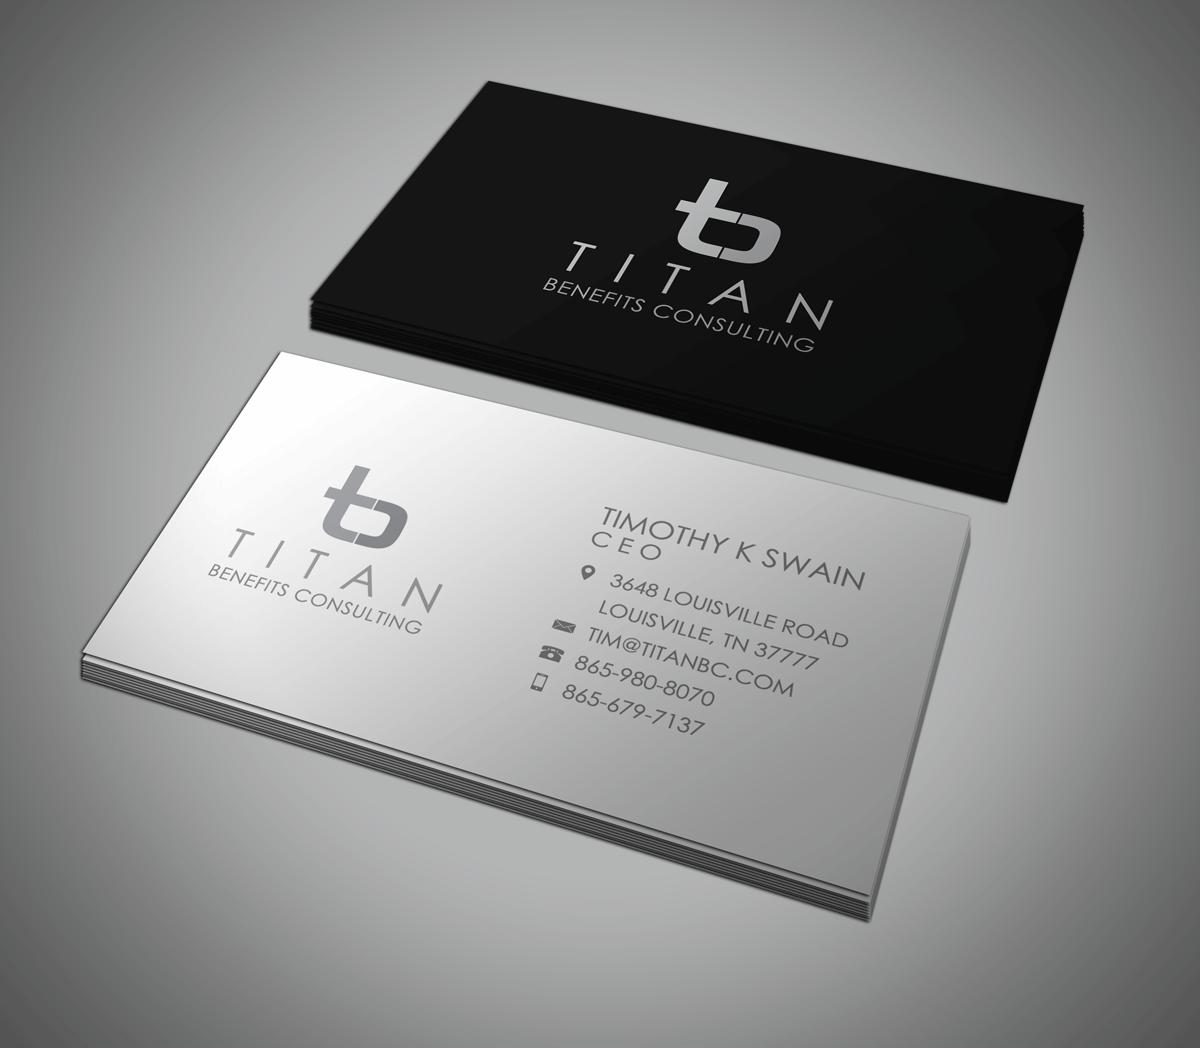 Insurance business card design for titan benefits by riz design business card design by riz for titan benefits design 9314570 colourmoves